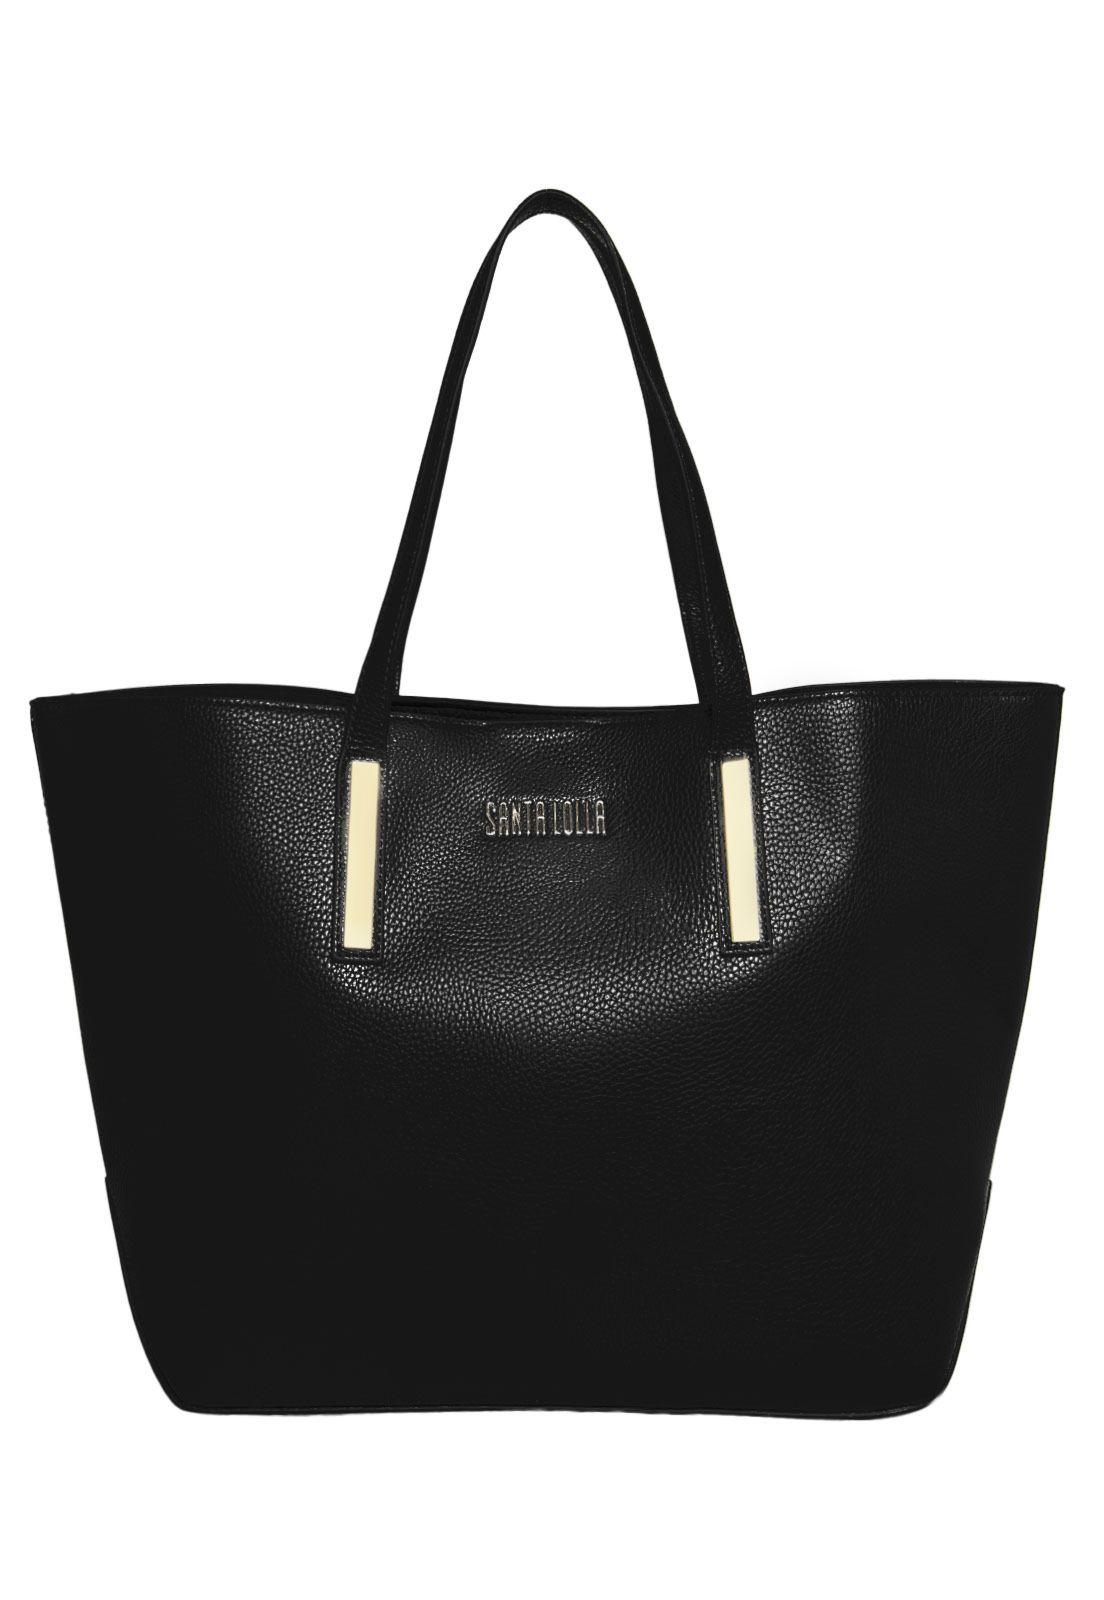 75803077b Bolsa Santa Lolla Craqueada Preta - Marca Santa Lolla | Accessories ...